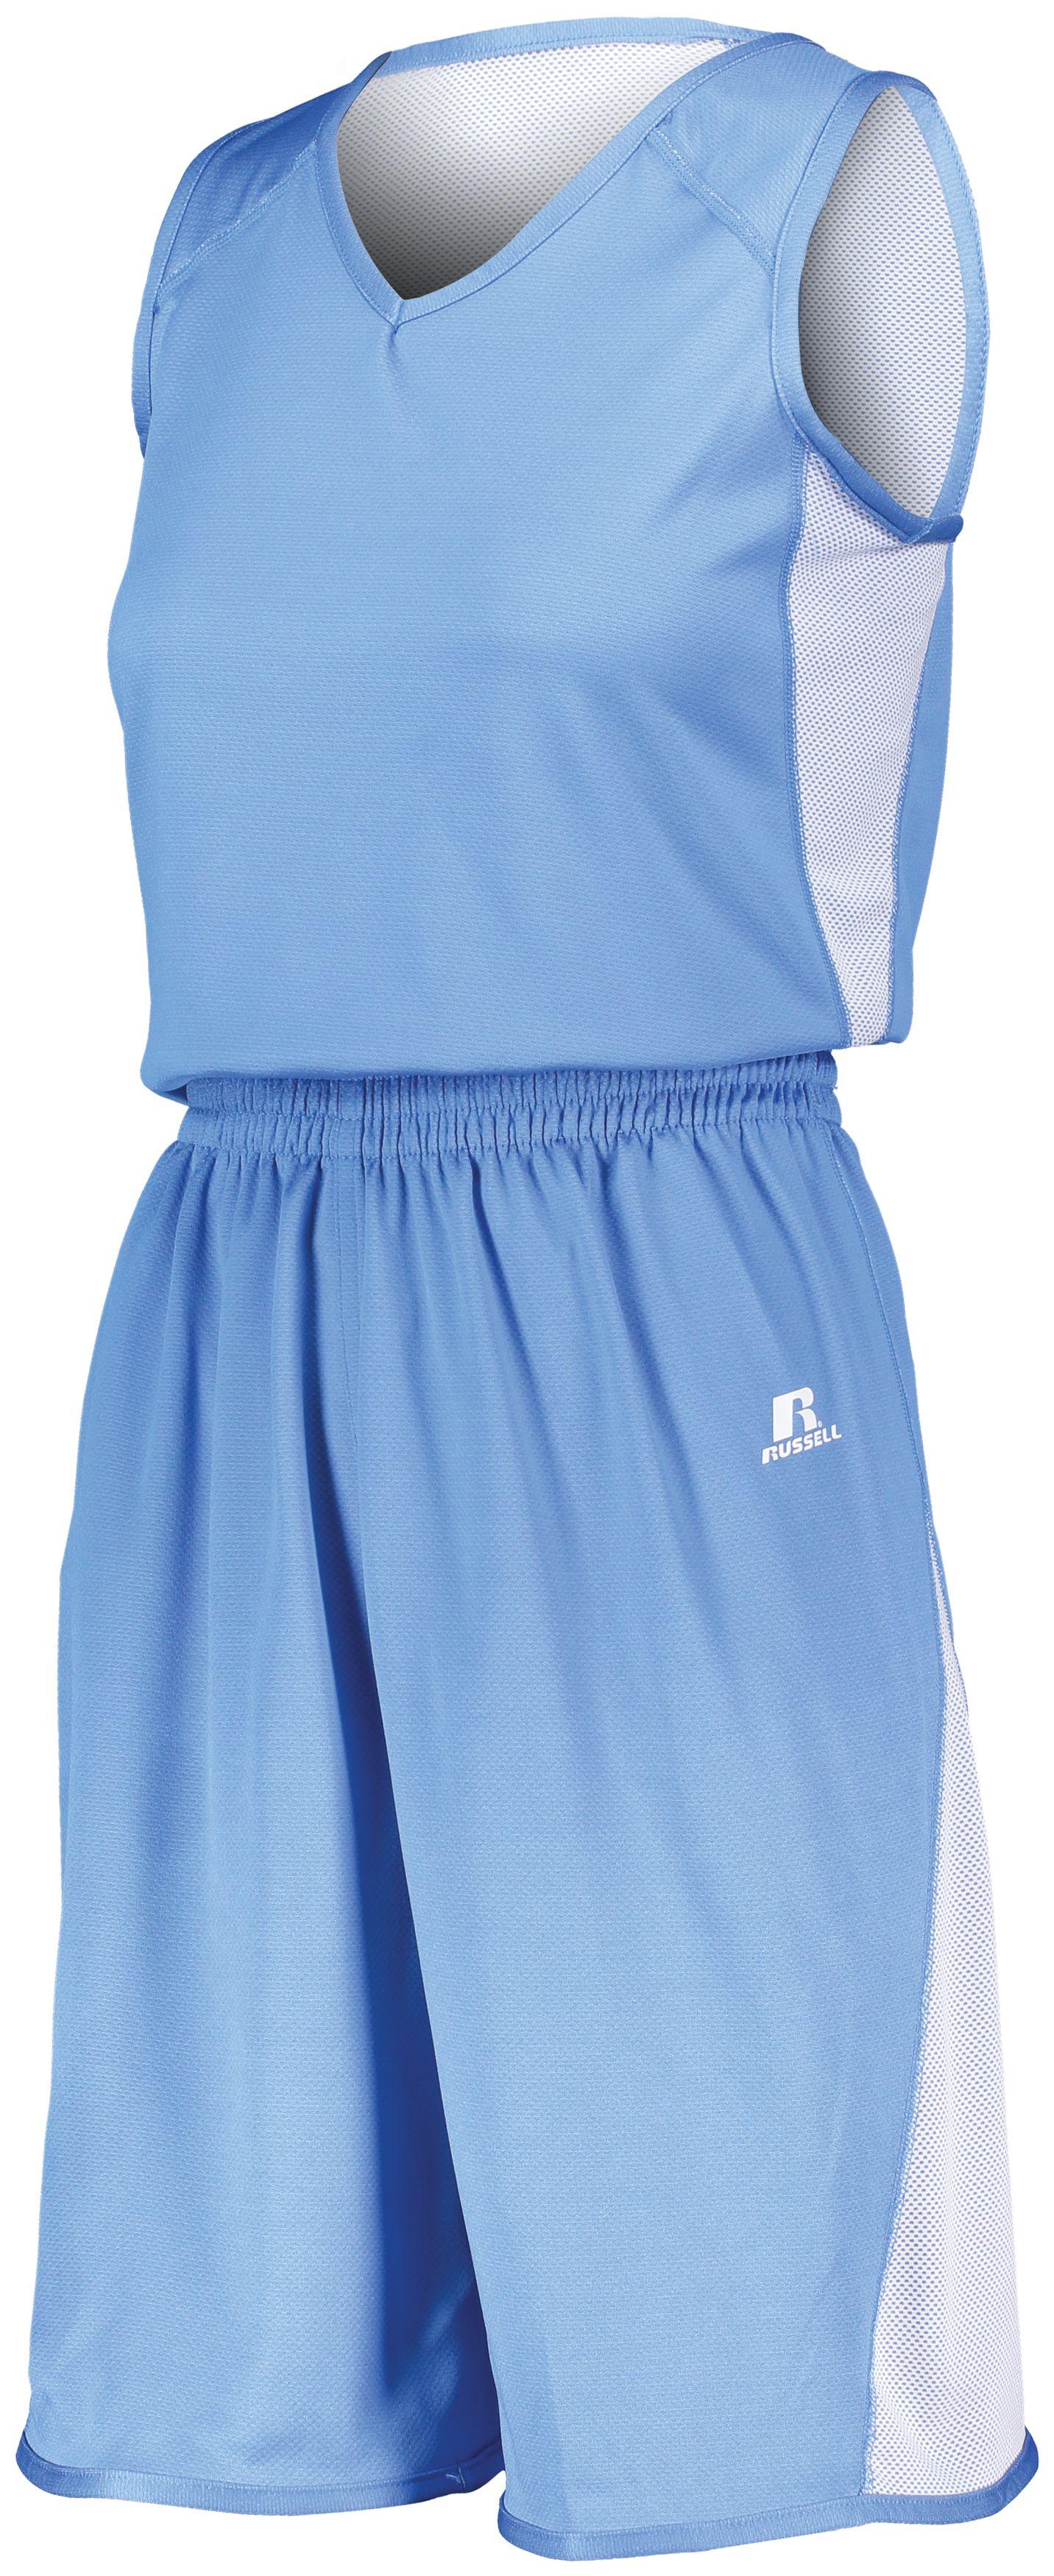 Ladies Undivided Single Ply Reversible Shorts - COLUMBIA BLUE/WHITE